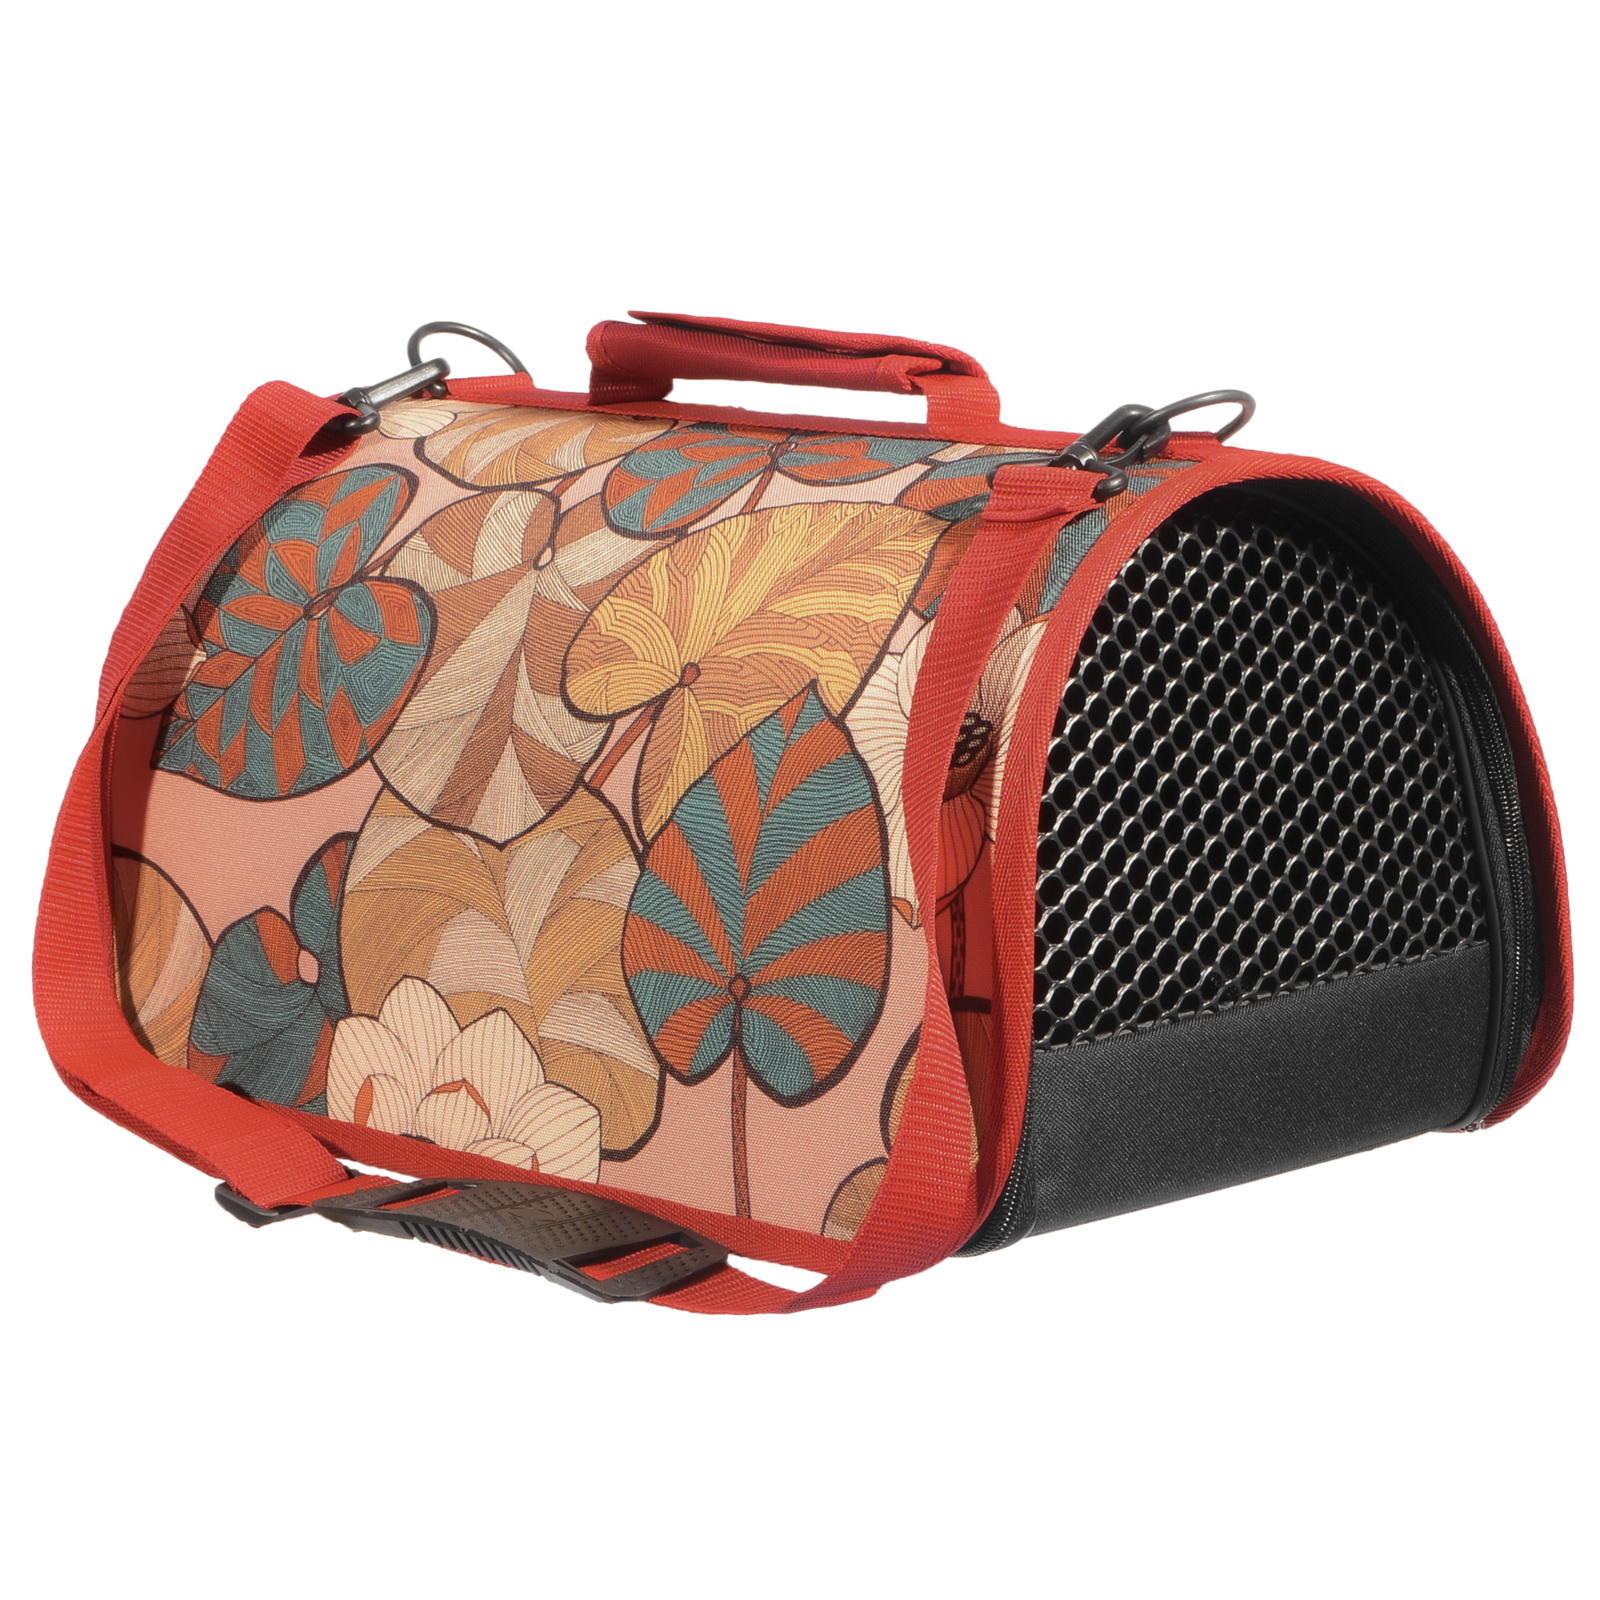 Tappi транспортировка Tappi транспортировка сумка-переноска